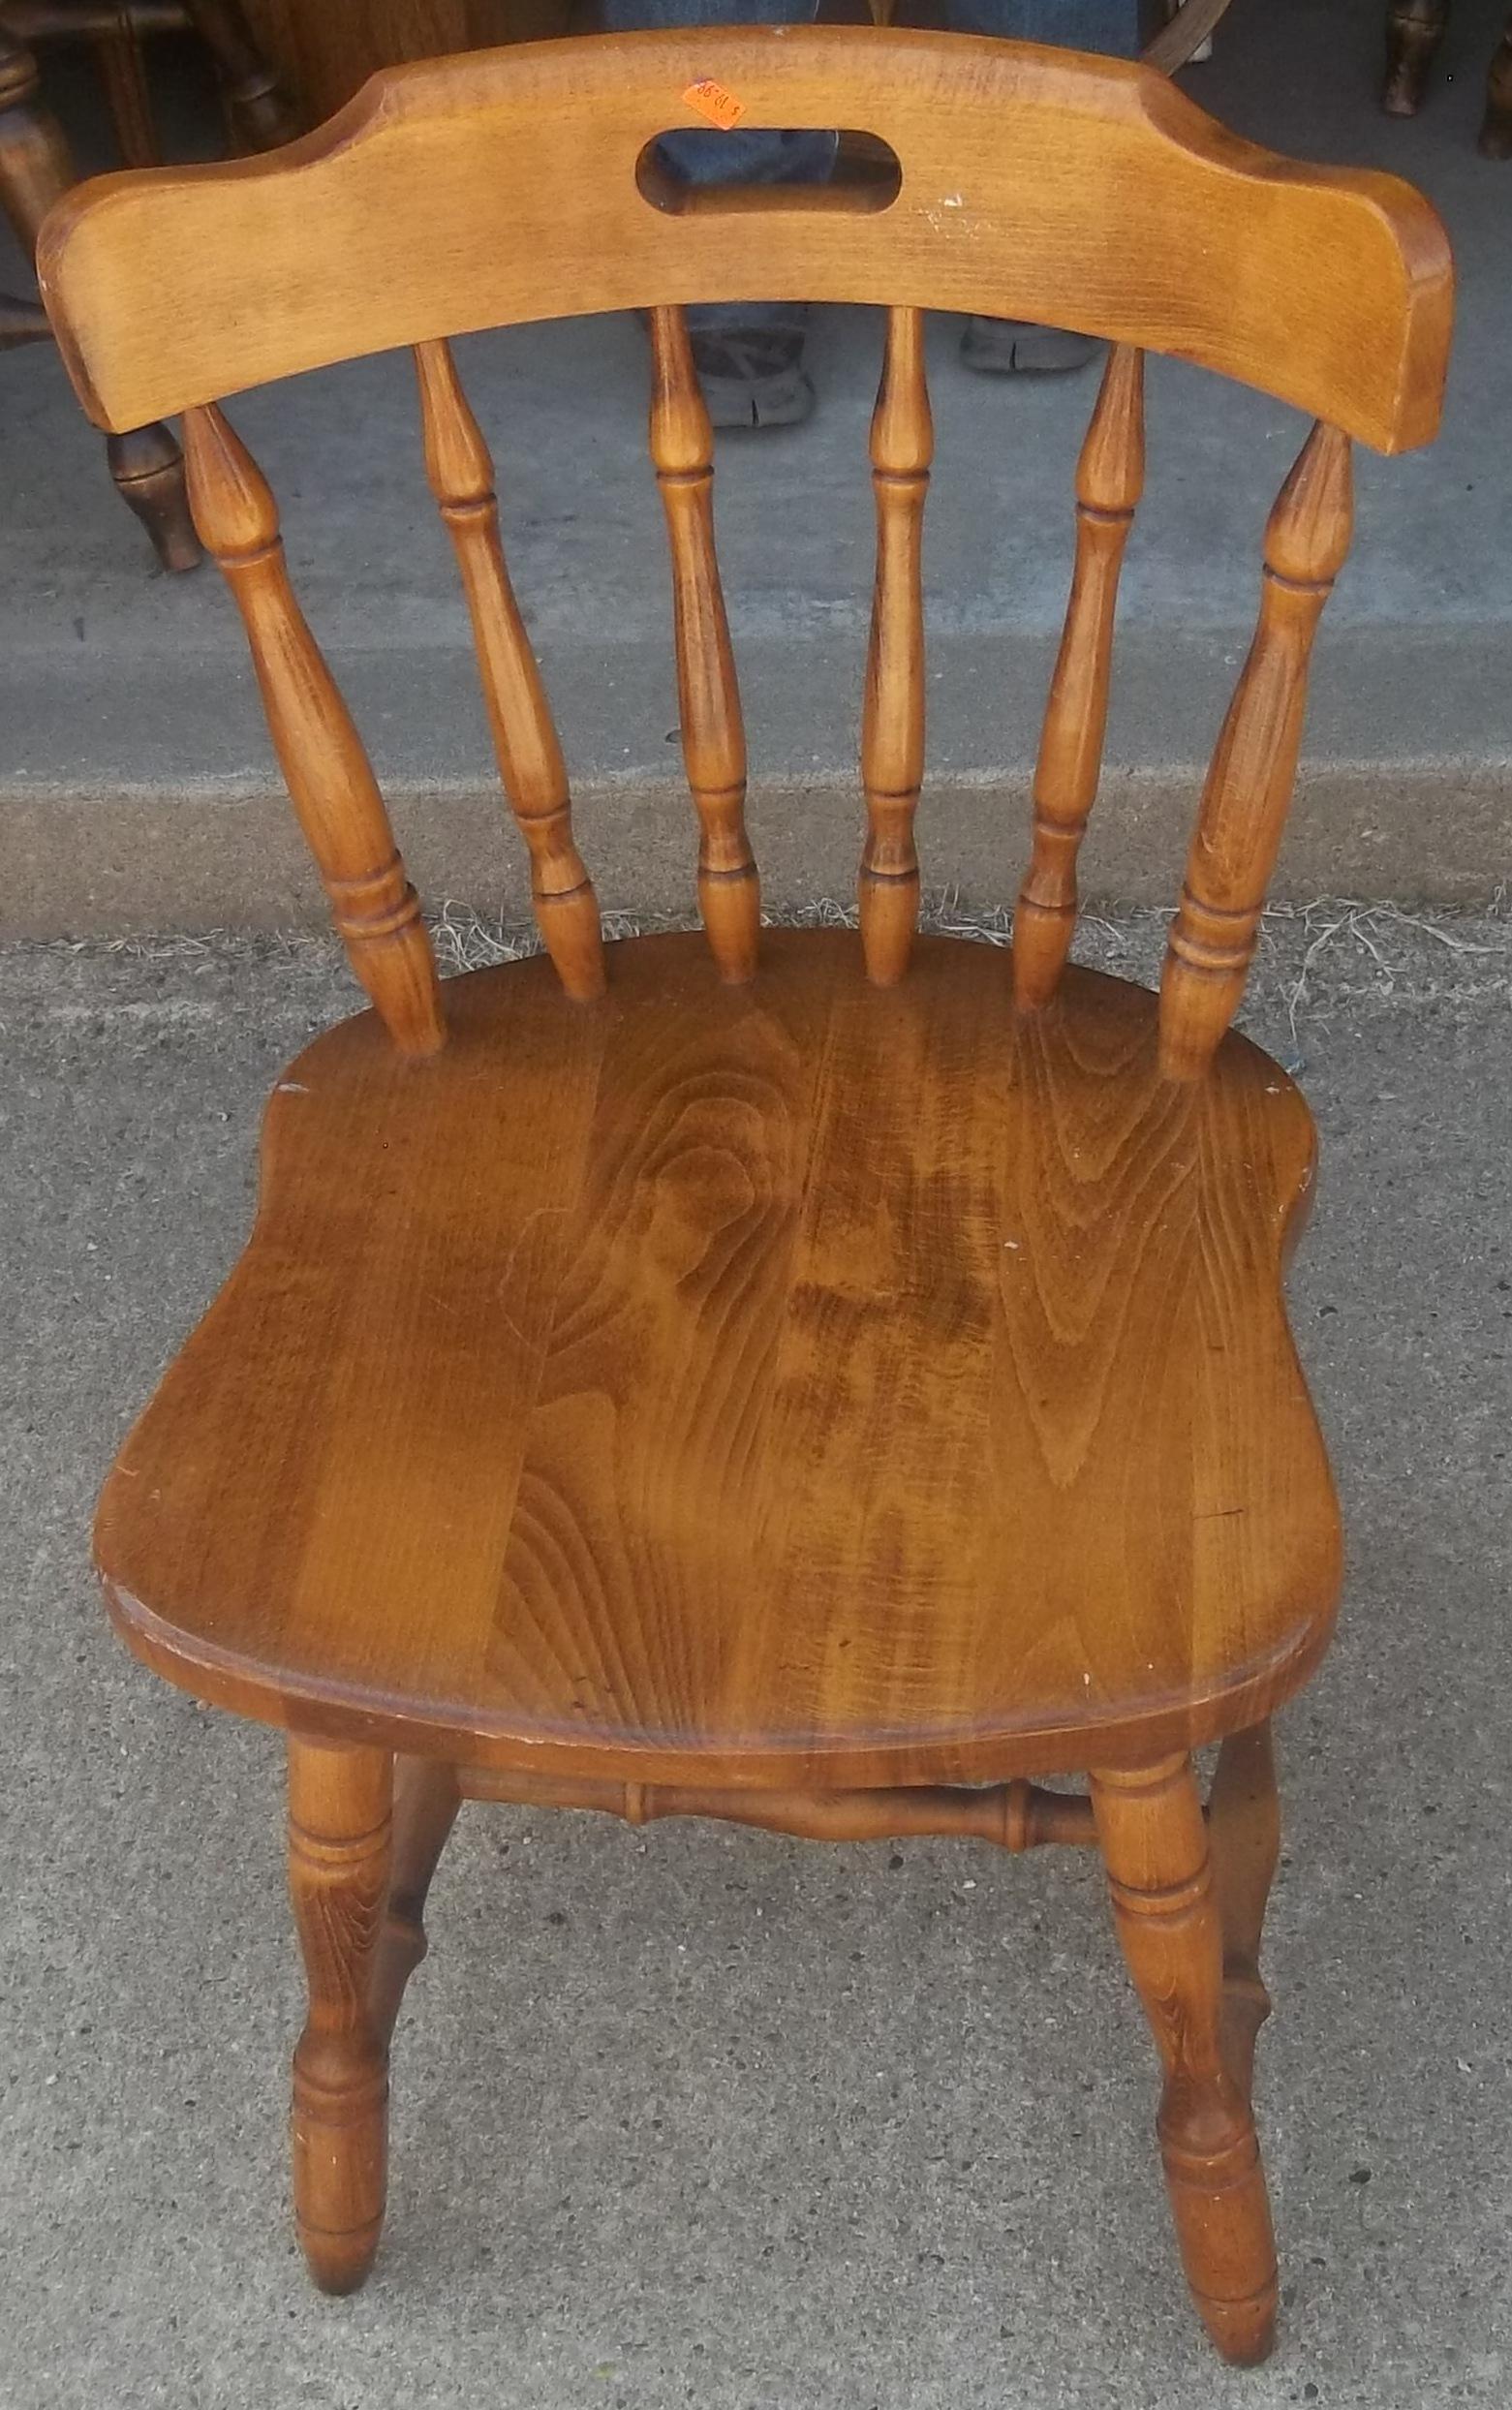 Maple kitchen chairs Photo - 7